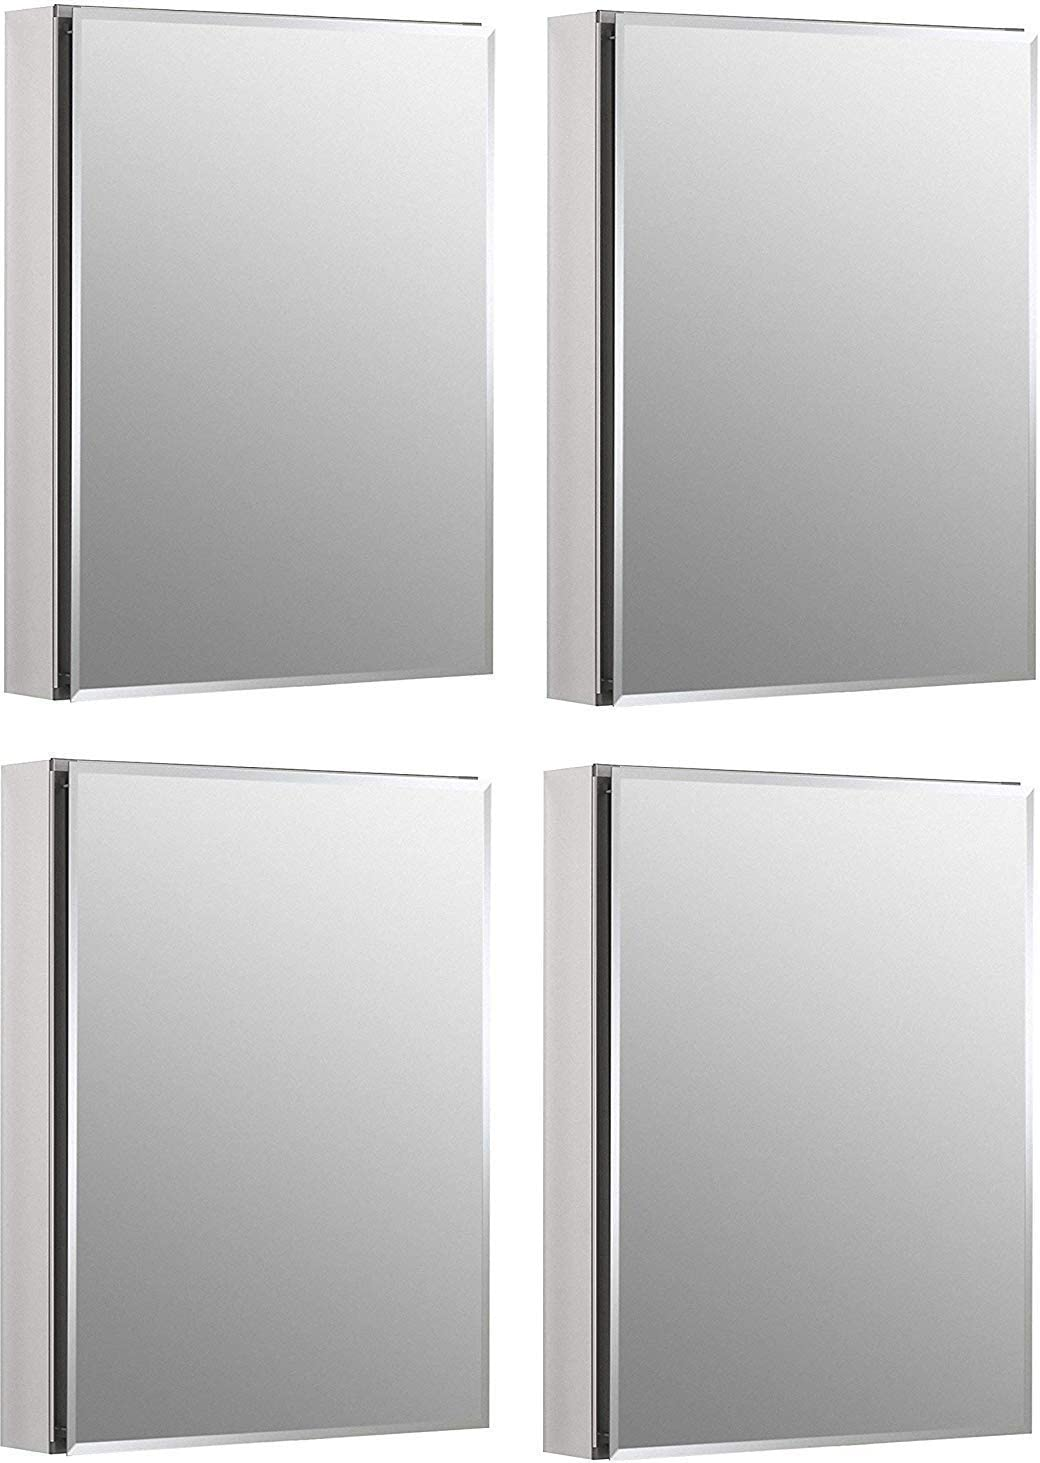 Kohler K-Cb-Clc2026Fs Armario de baño de Aluminio sin Marco, de 20 ...